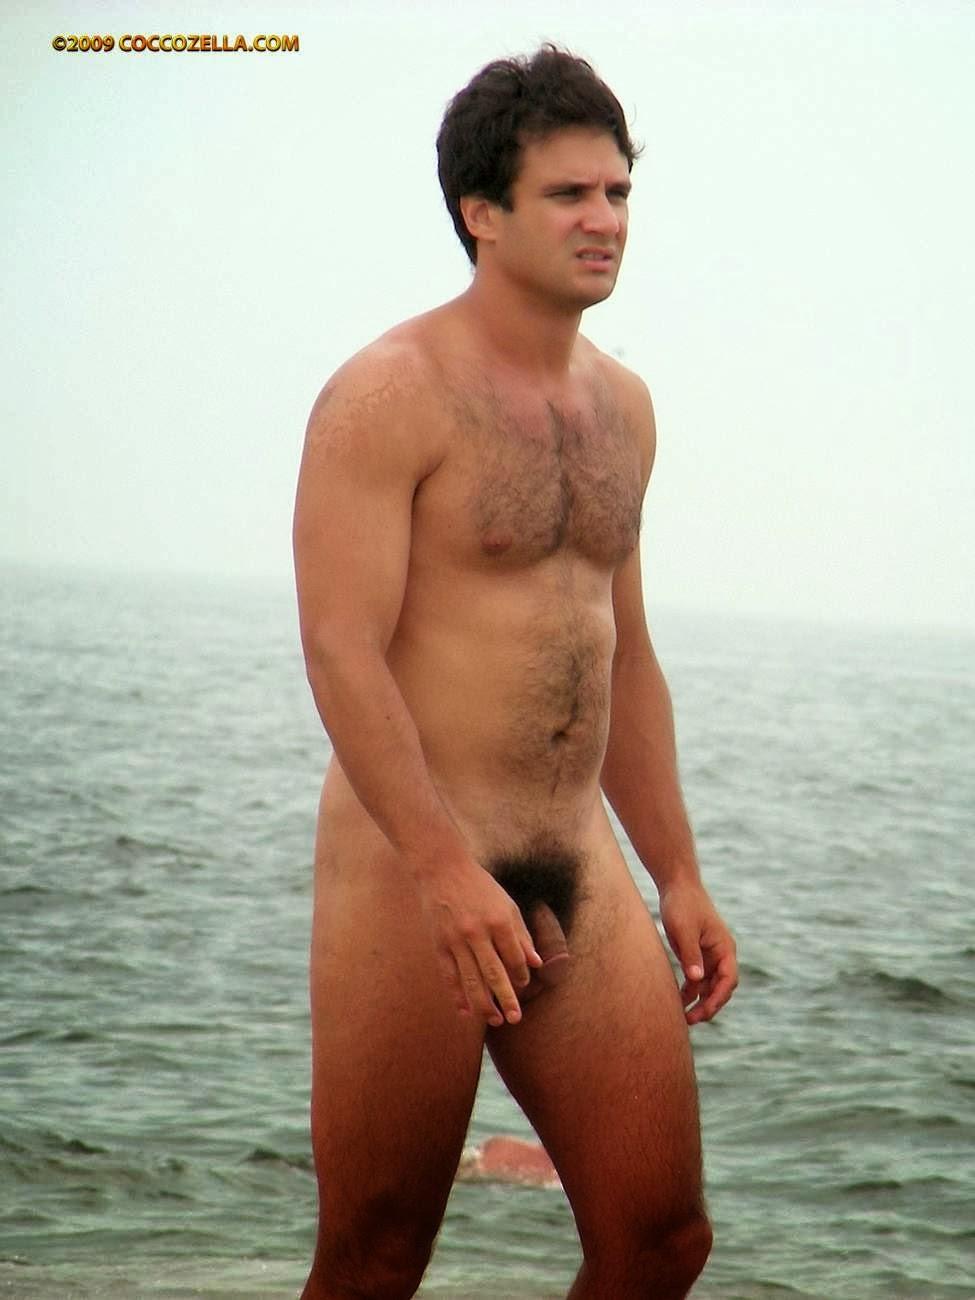 naked photo rufus sewell